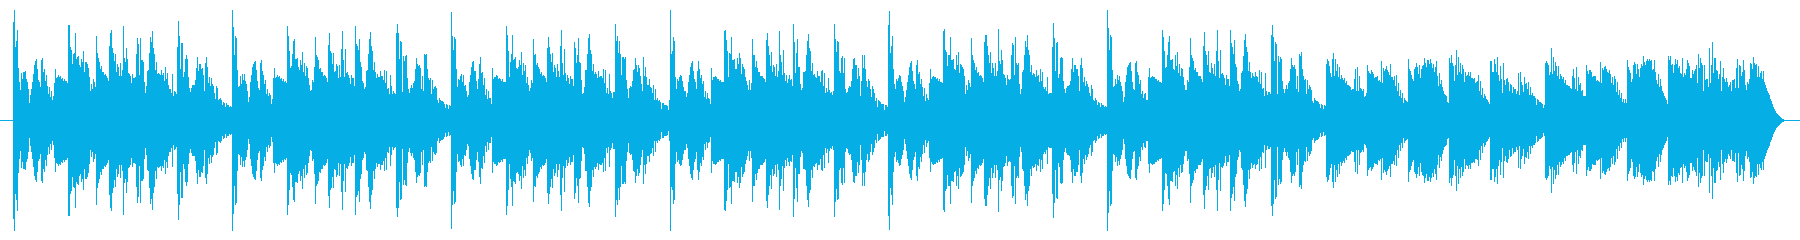 Tiktok に! 15秒の再生済みの波形